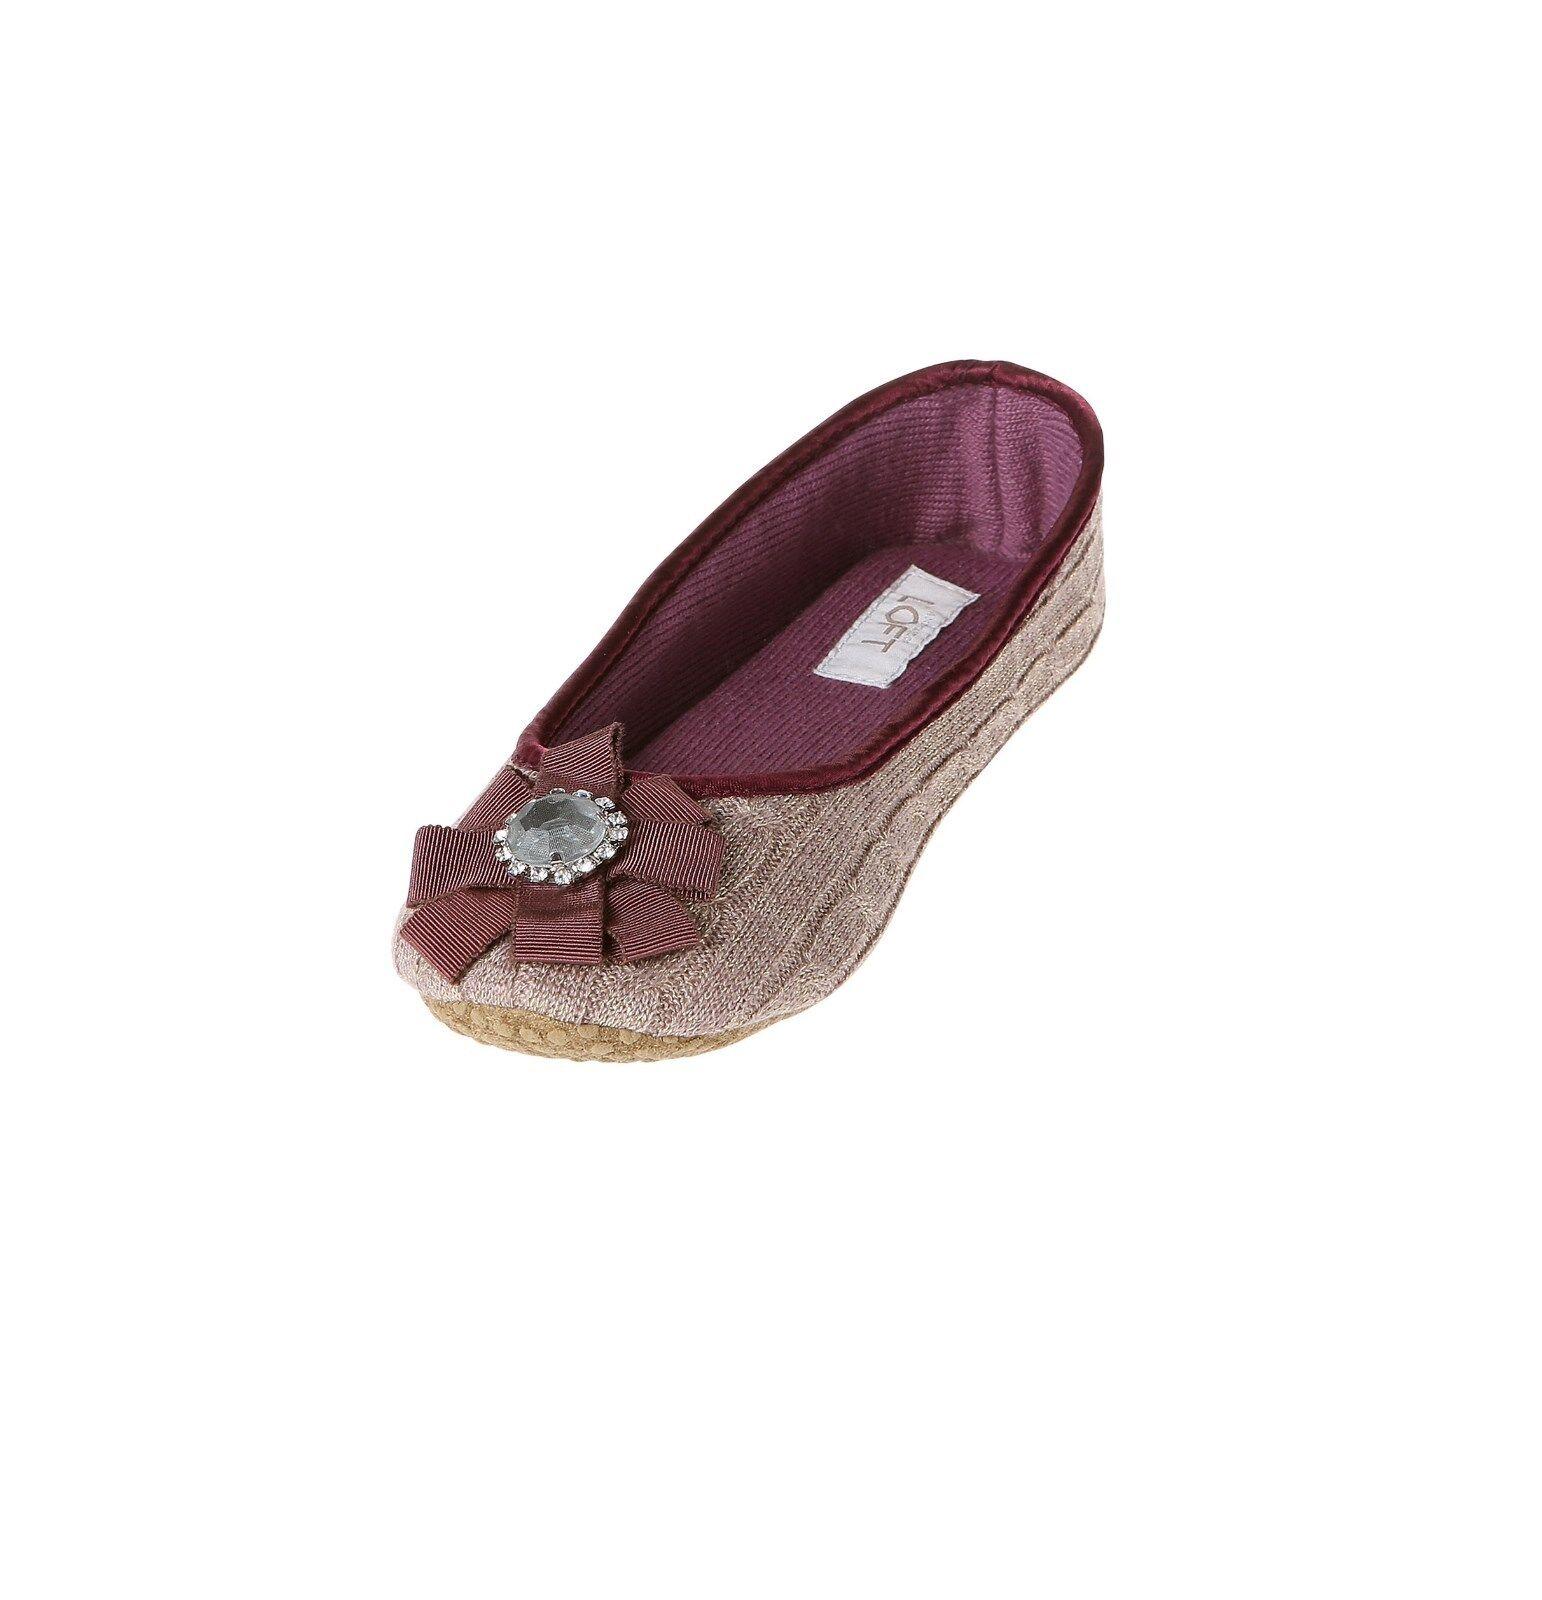 NWT Ann Taylor Loft Jeweled Ballet Slippers, Tan, XL/Size 12 #1v